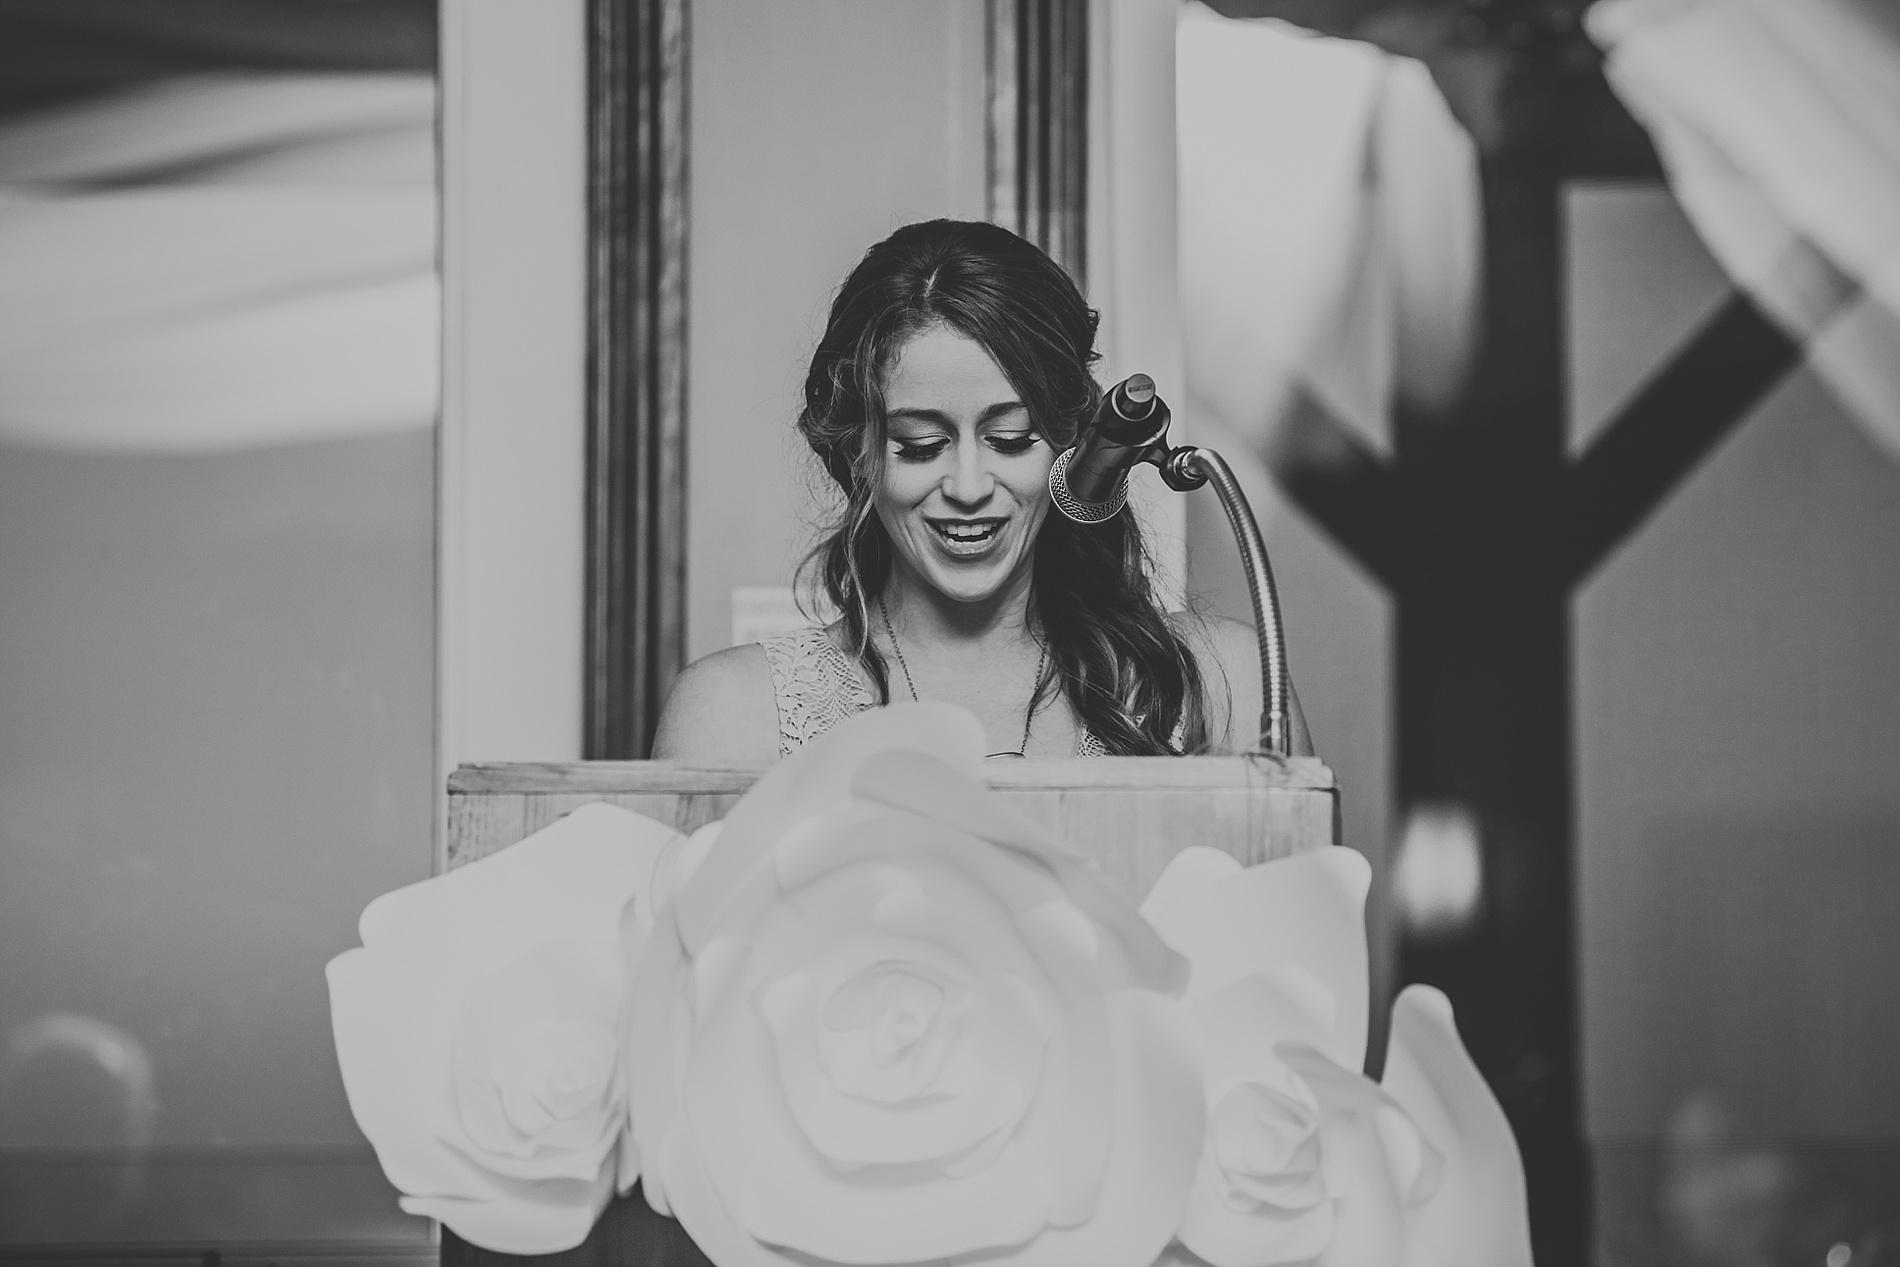 Kawartha_Lakes_Wedding_Bobcageon_Eganridge_Resort_Toronto_Photographer_0077.jpg